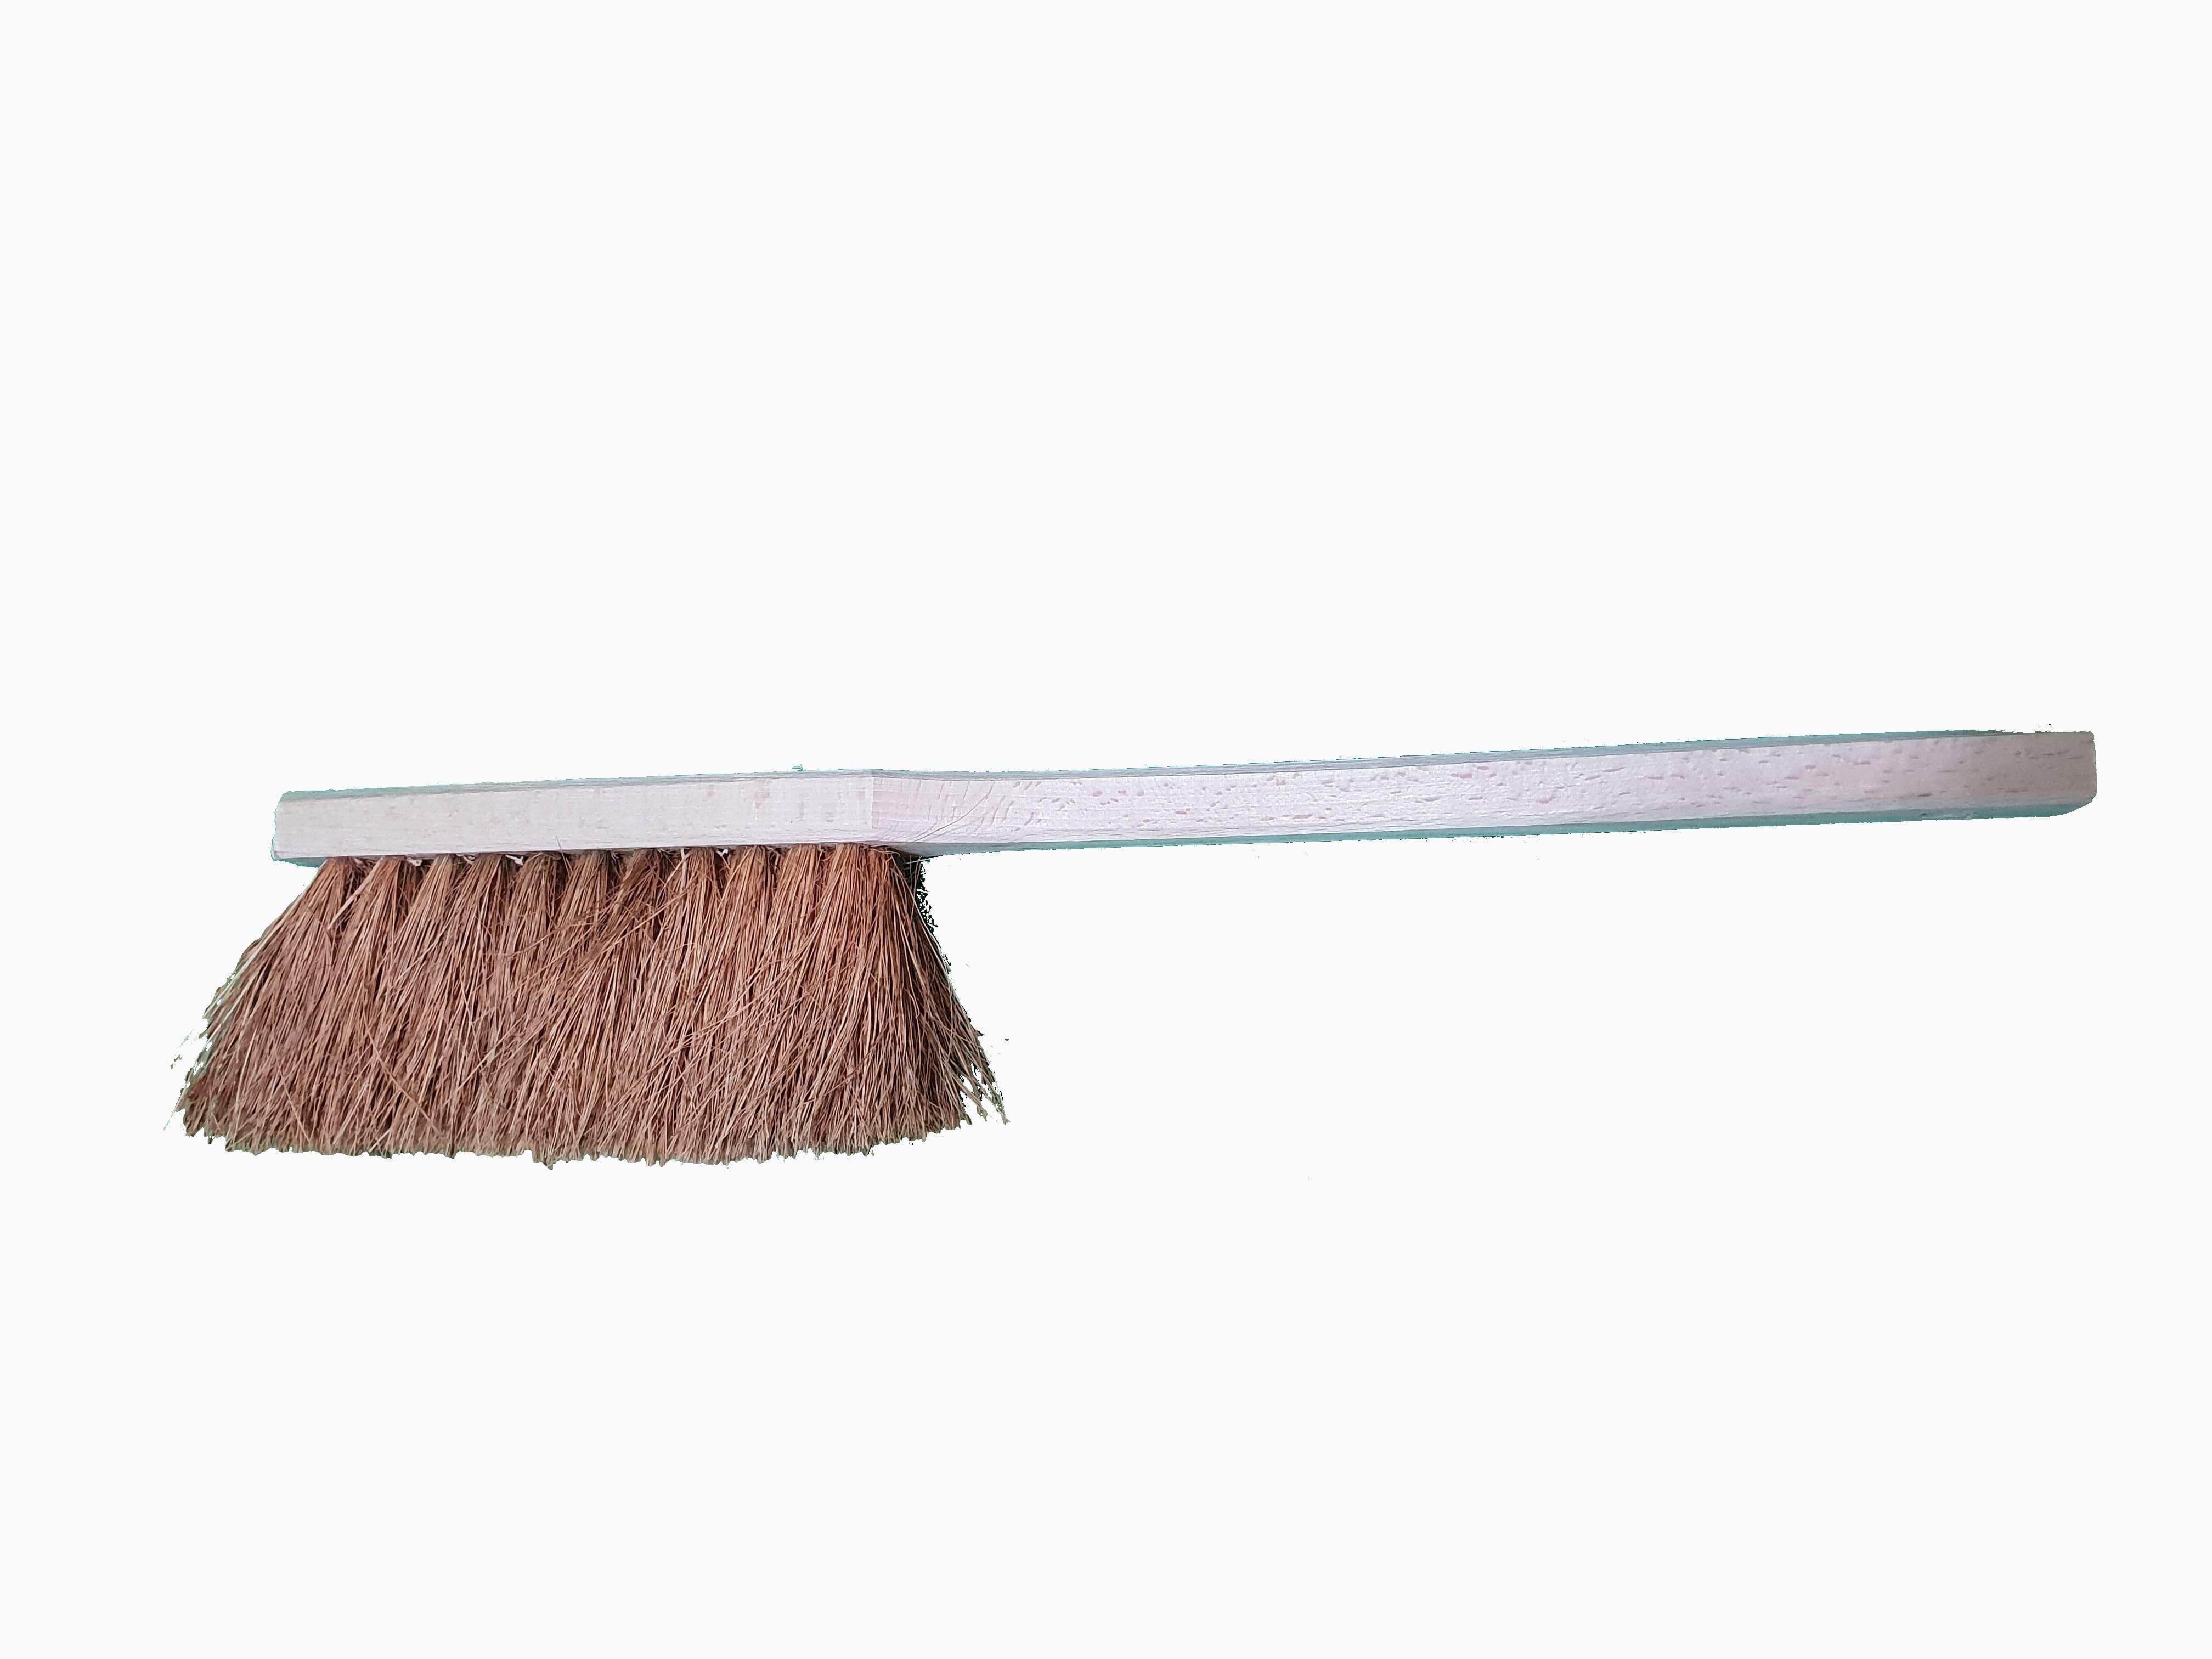 RPS Soft Coconut Bristle Hand Brush